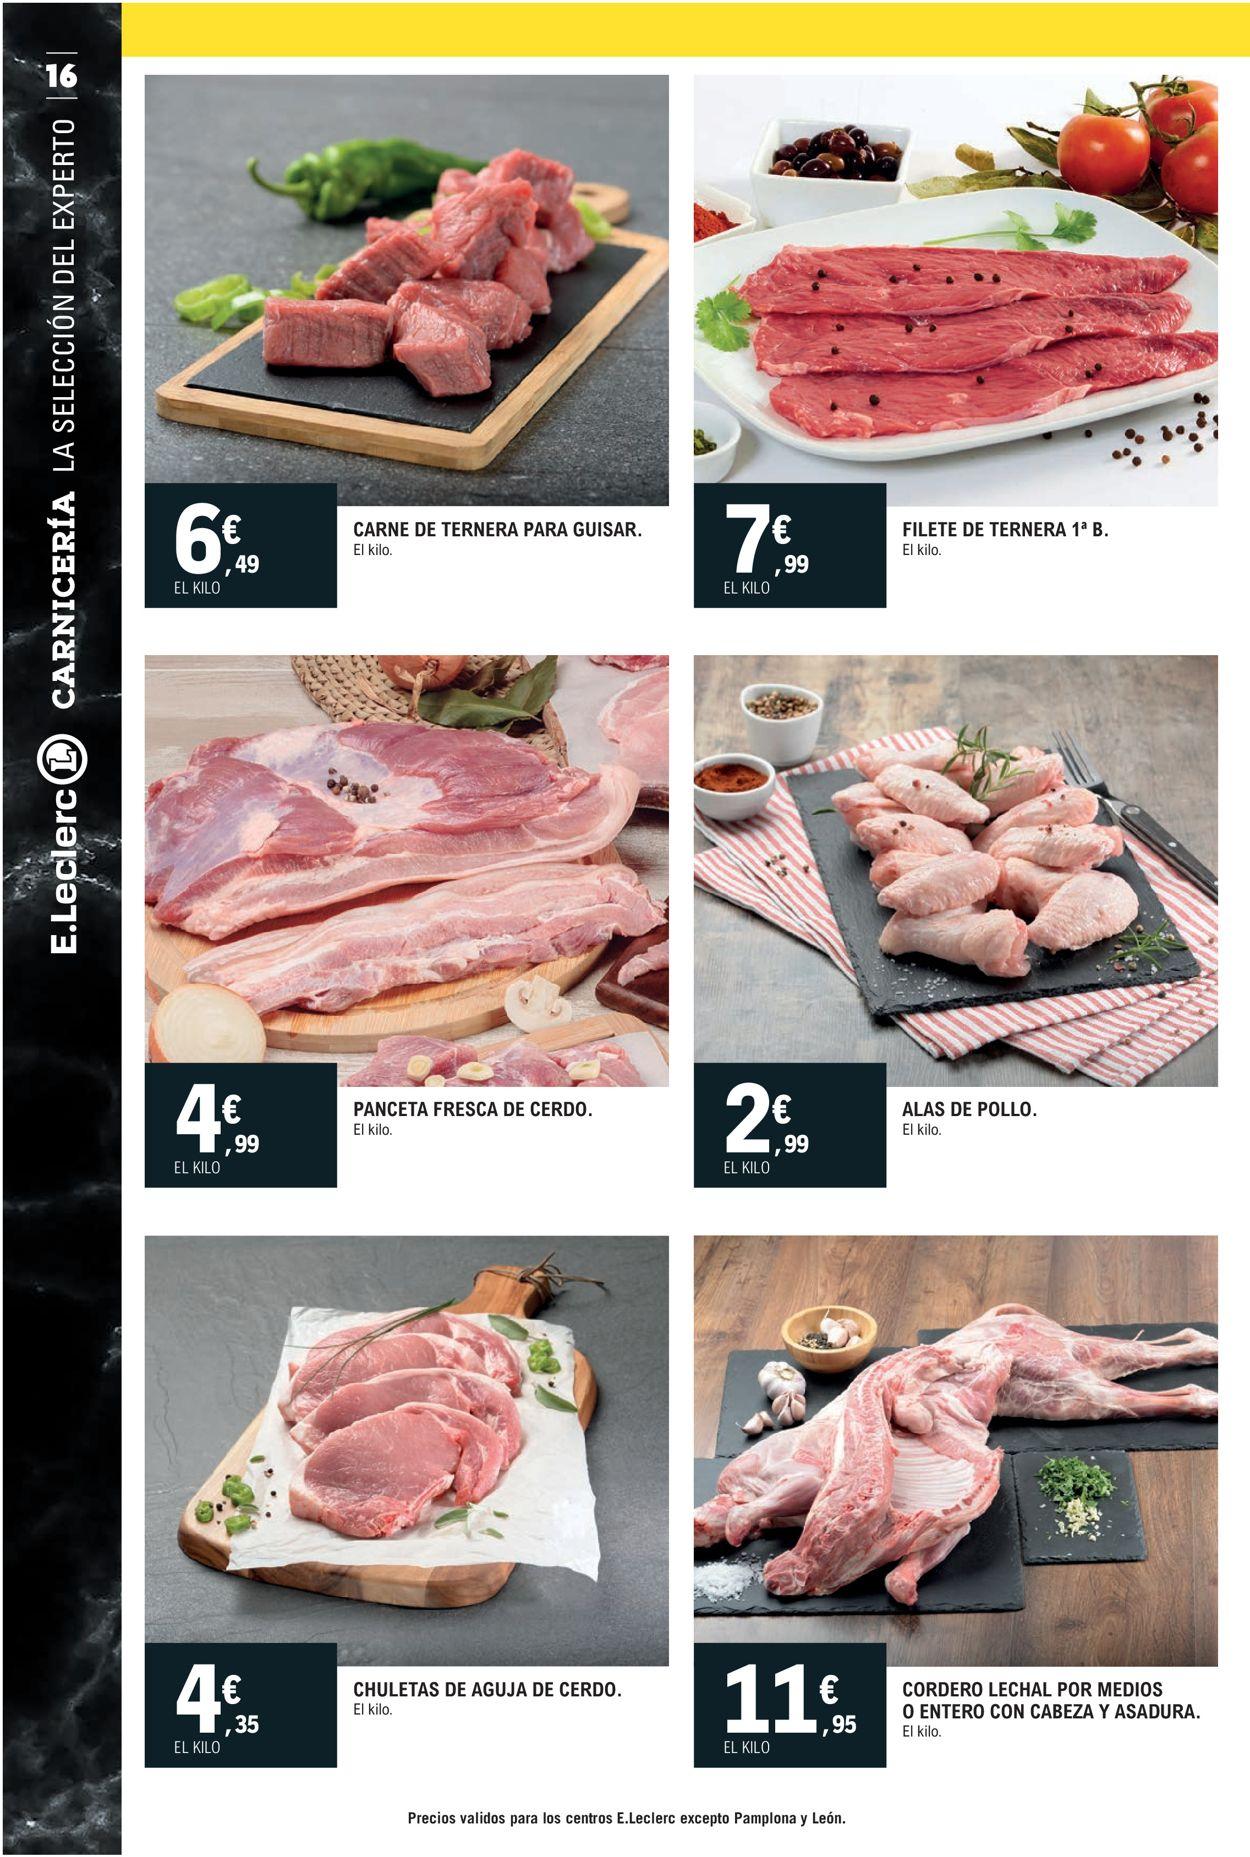 E.leclerc Folleto - 11.11-22.11.2020 (Página 16)